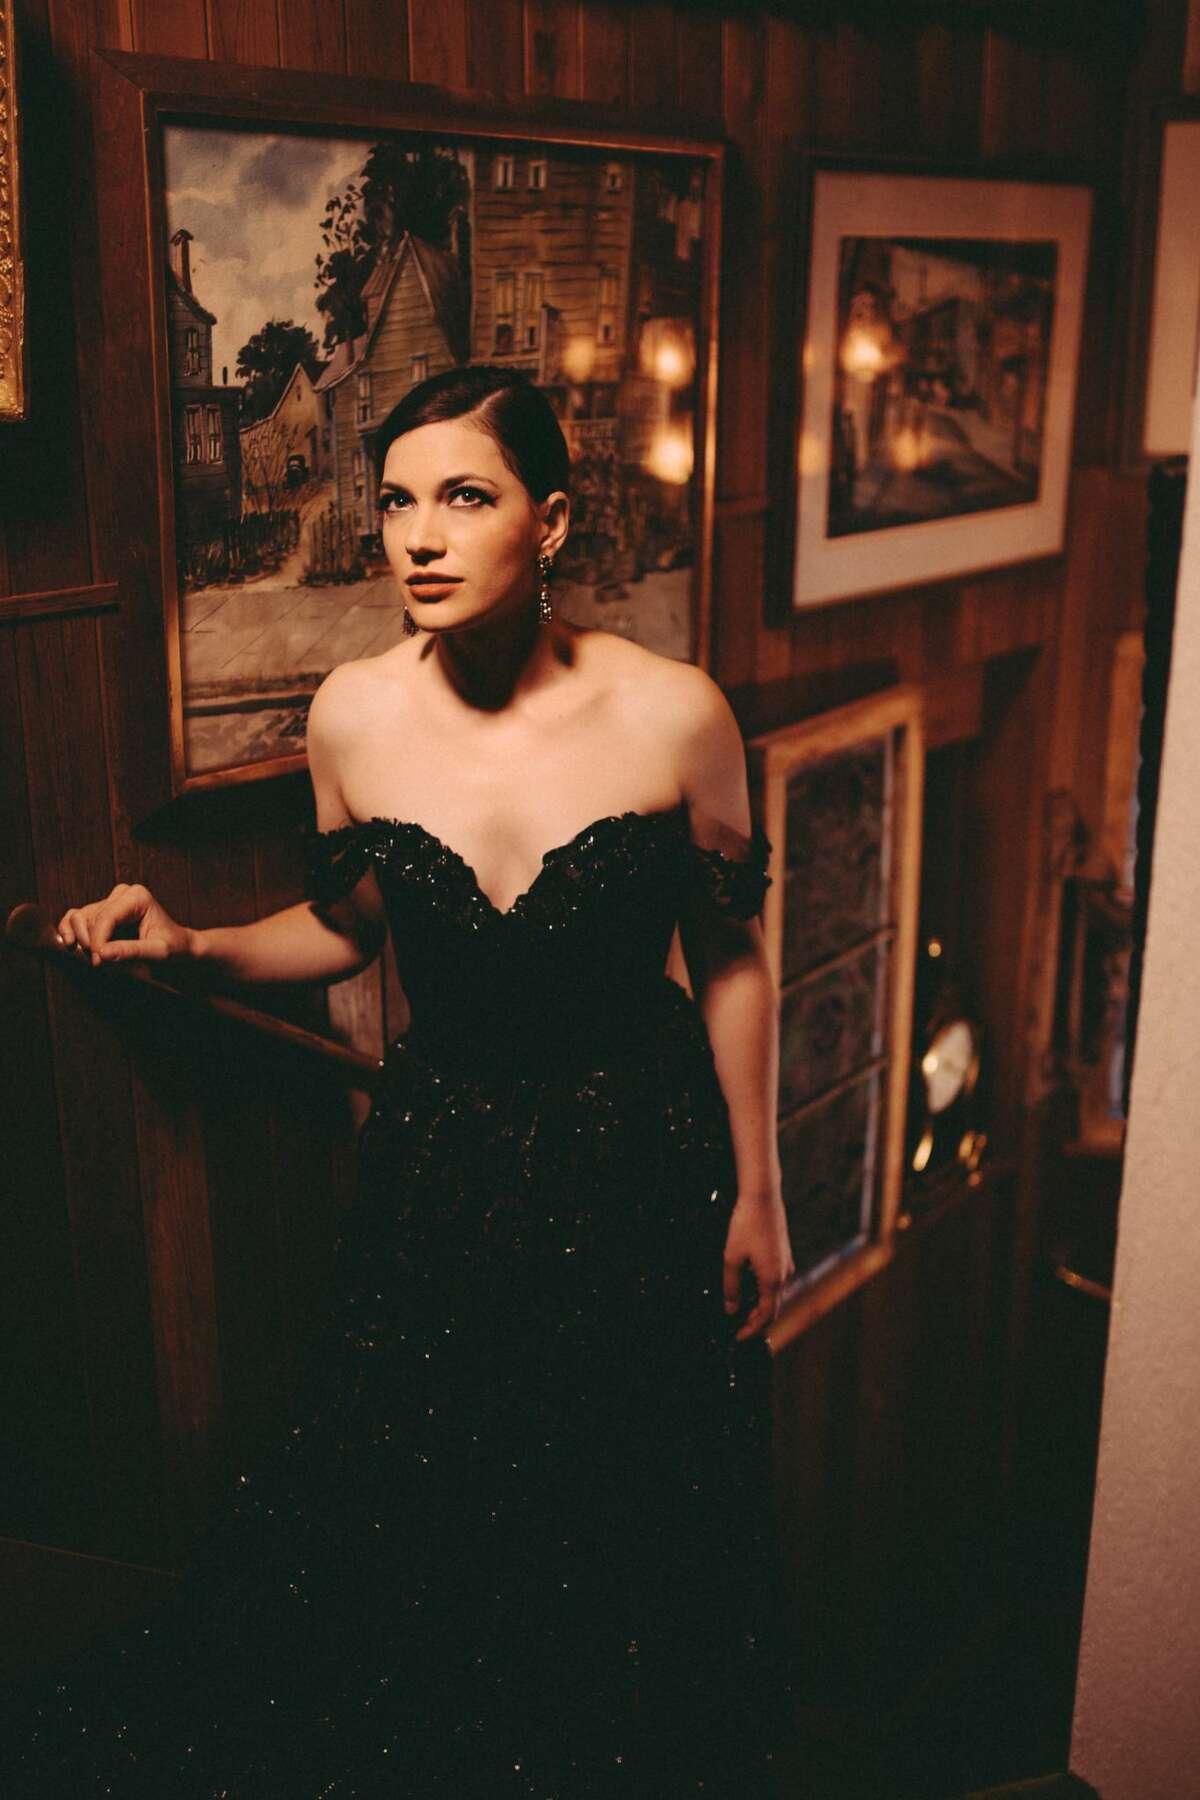 Kimberly Hawkey (Credit Drew Bordeaux)